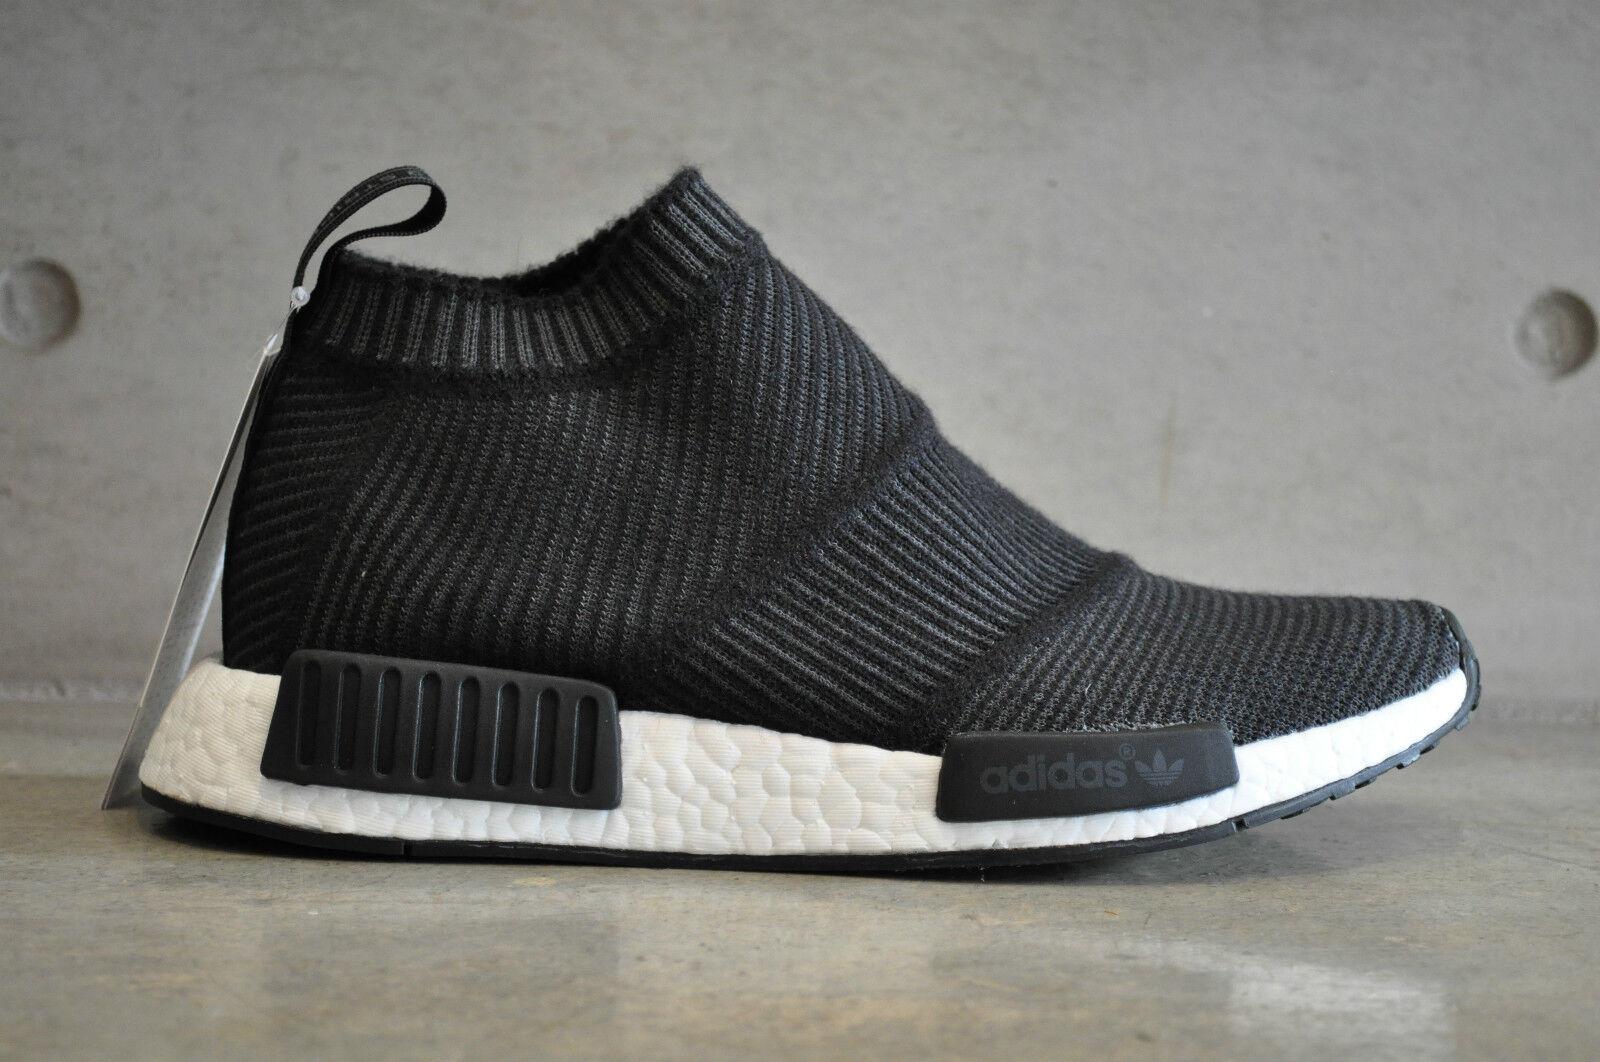 Adidas NMD City Sock CS1 PK Primeknit Winter Wool - Black White